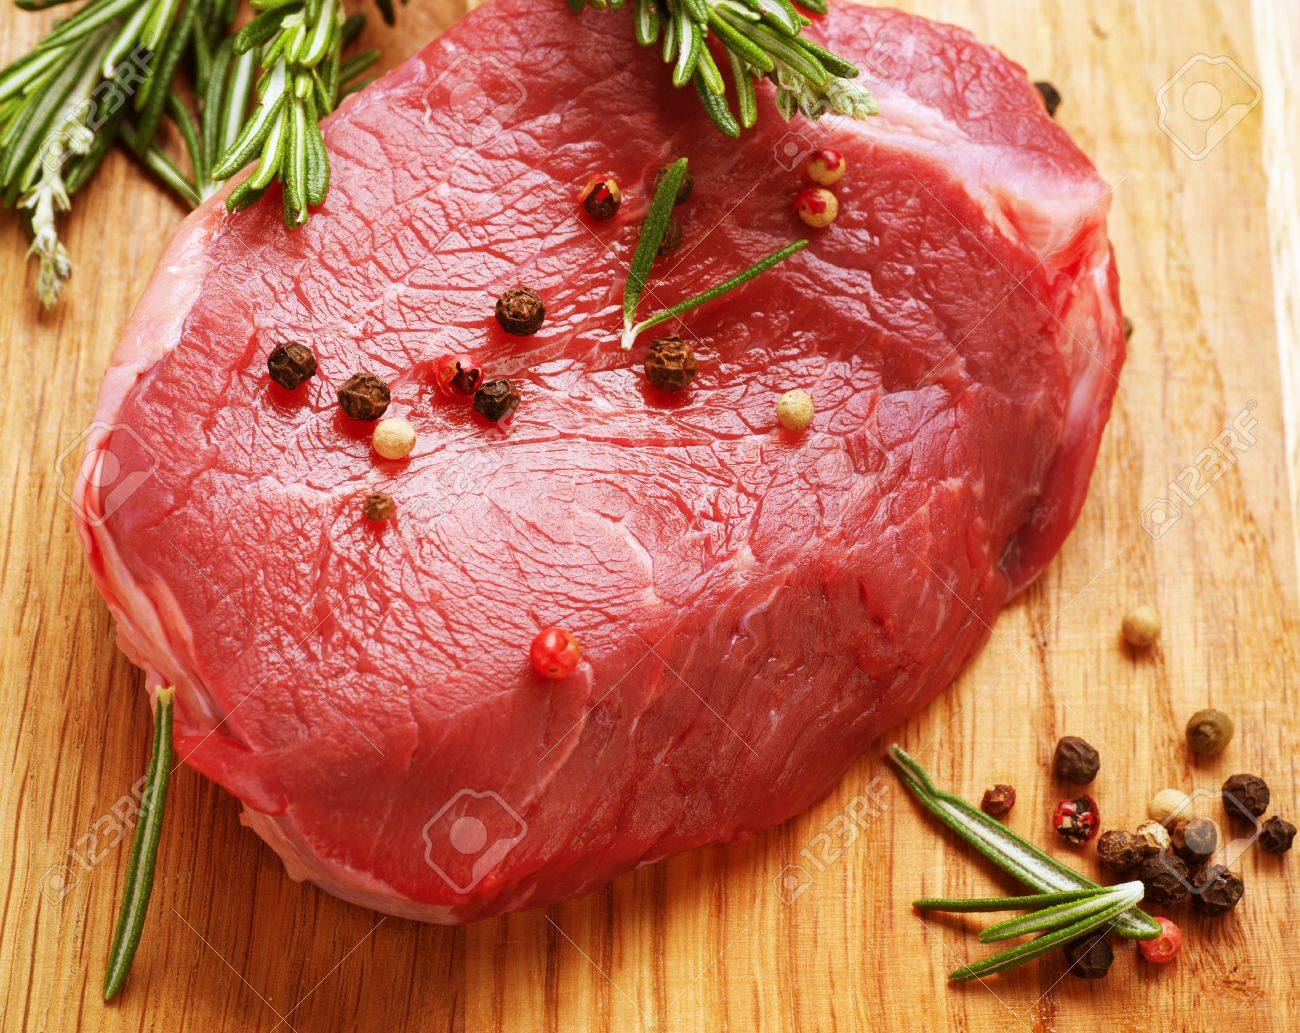 Raw Beef Steak Stock Photo - 14054772